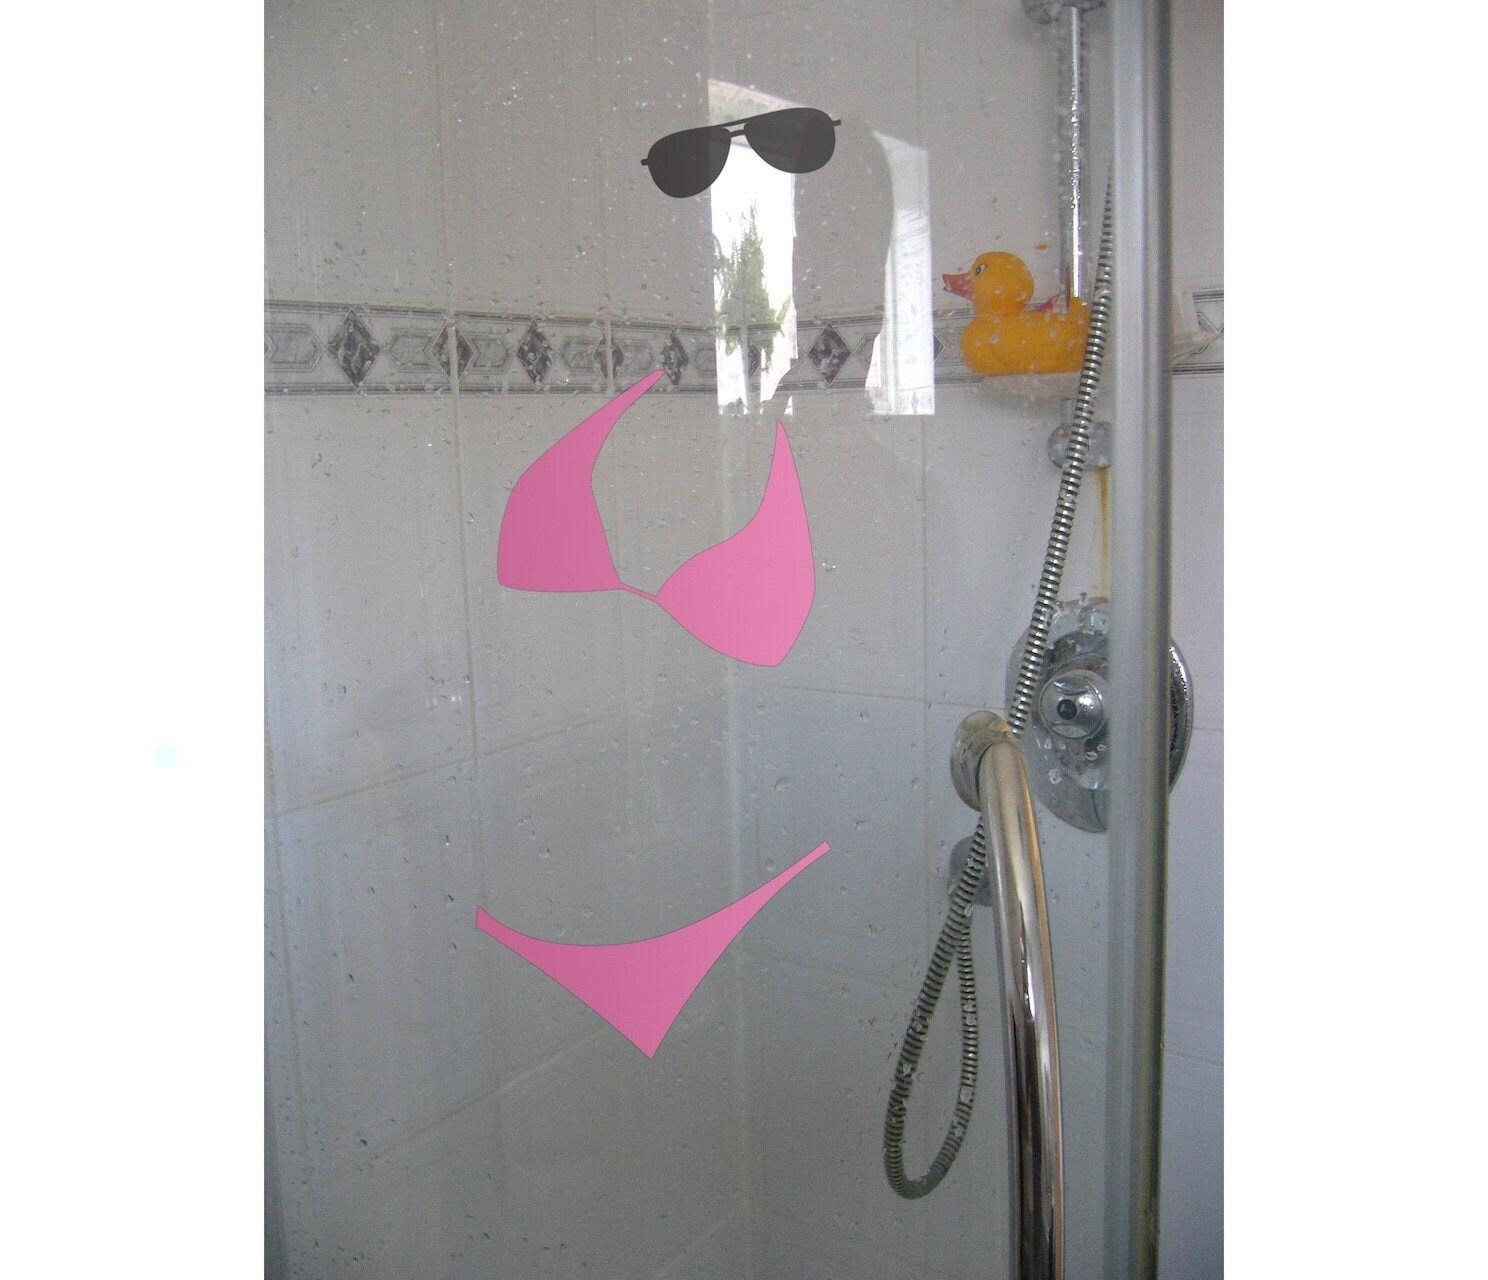 Bikini Wall Sticker - Fun Bathroom Shower Decals